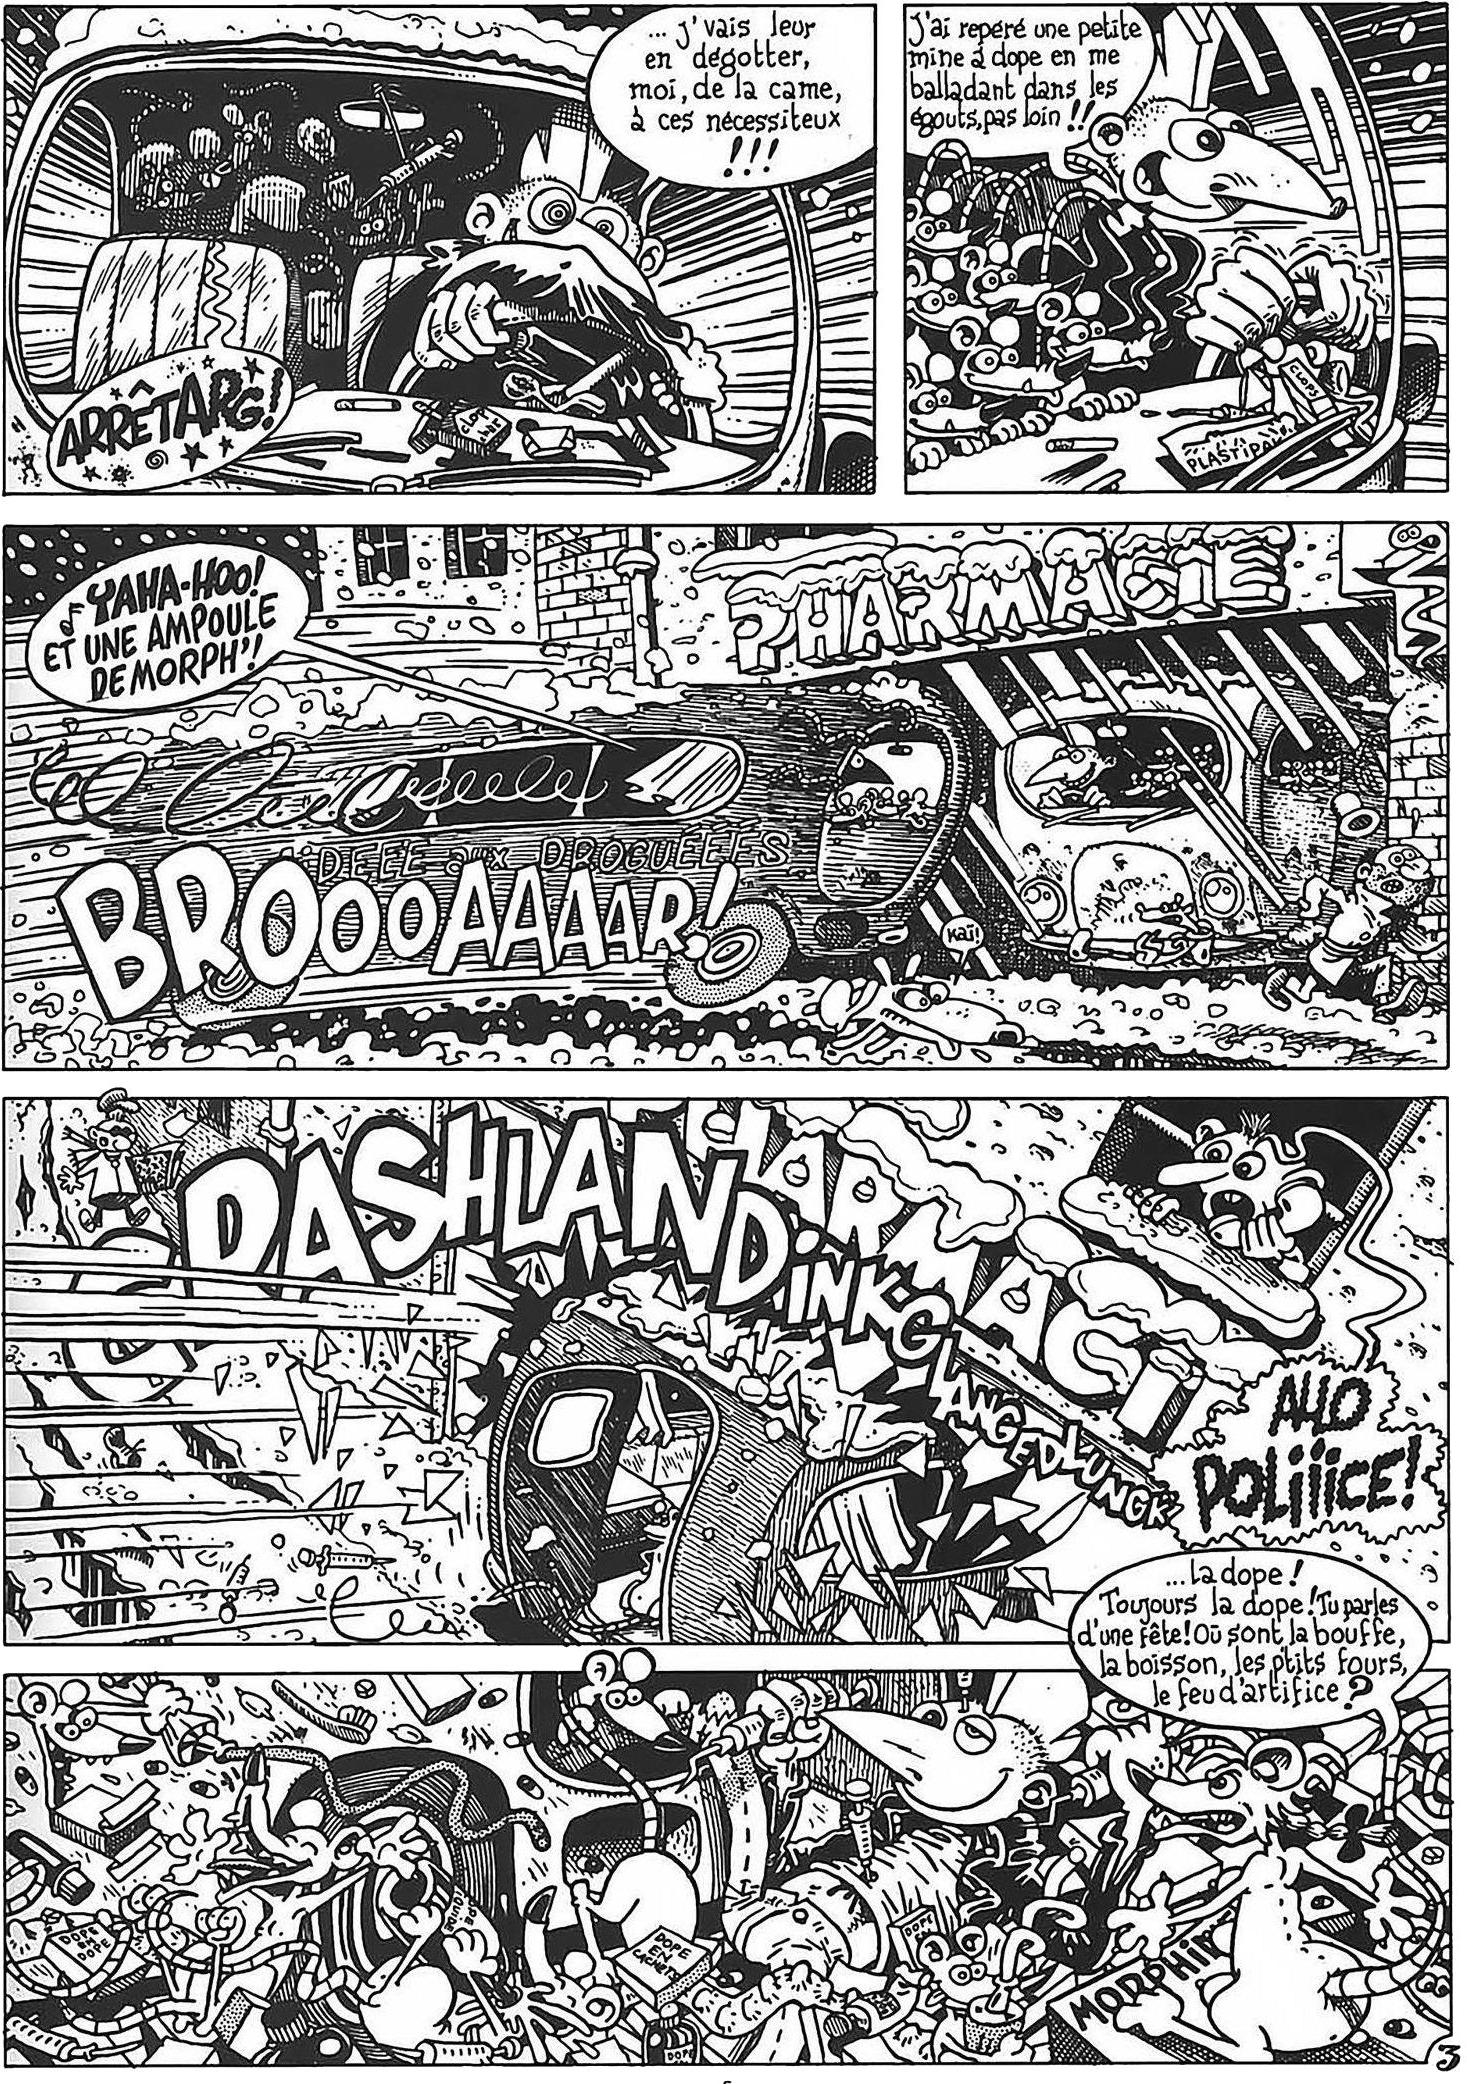 Punk Aid 3, ASUD journal N°10 (automne 1995)